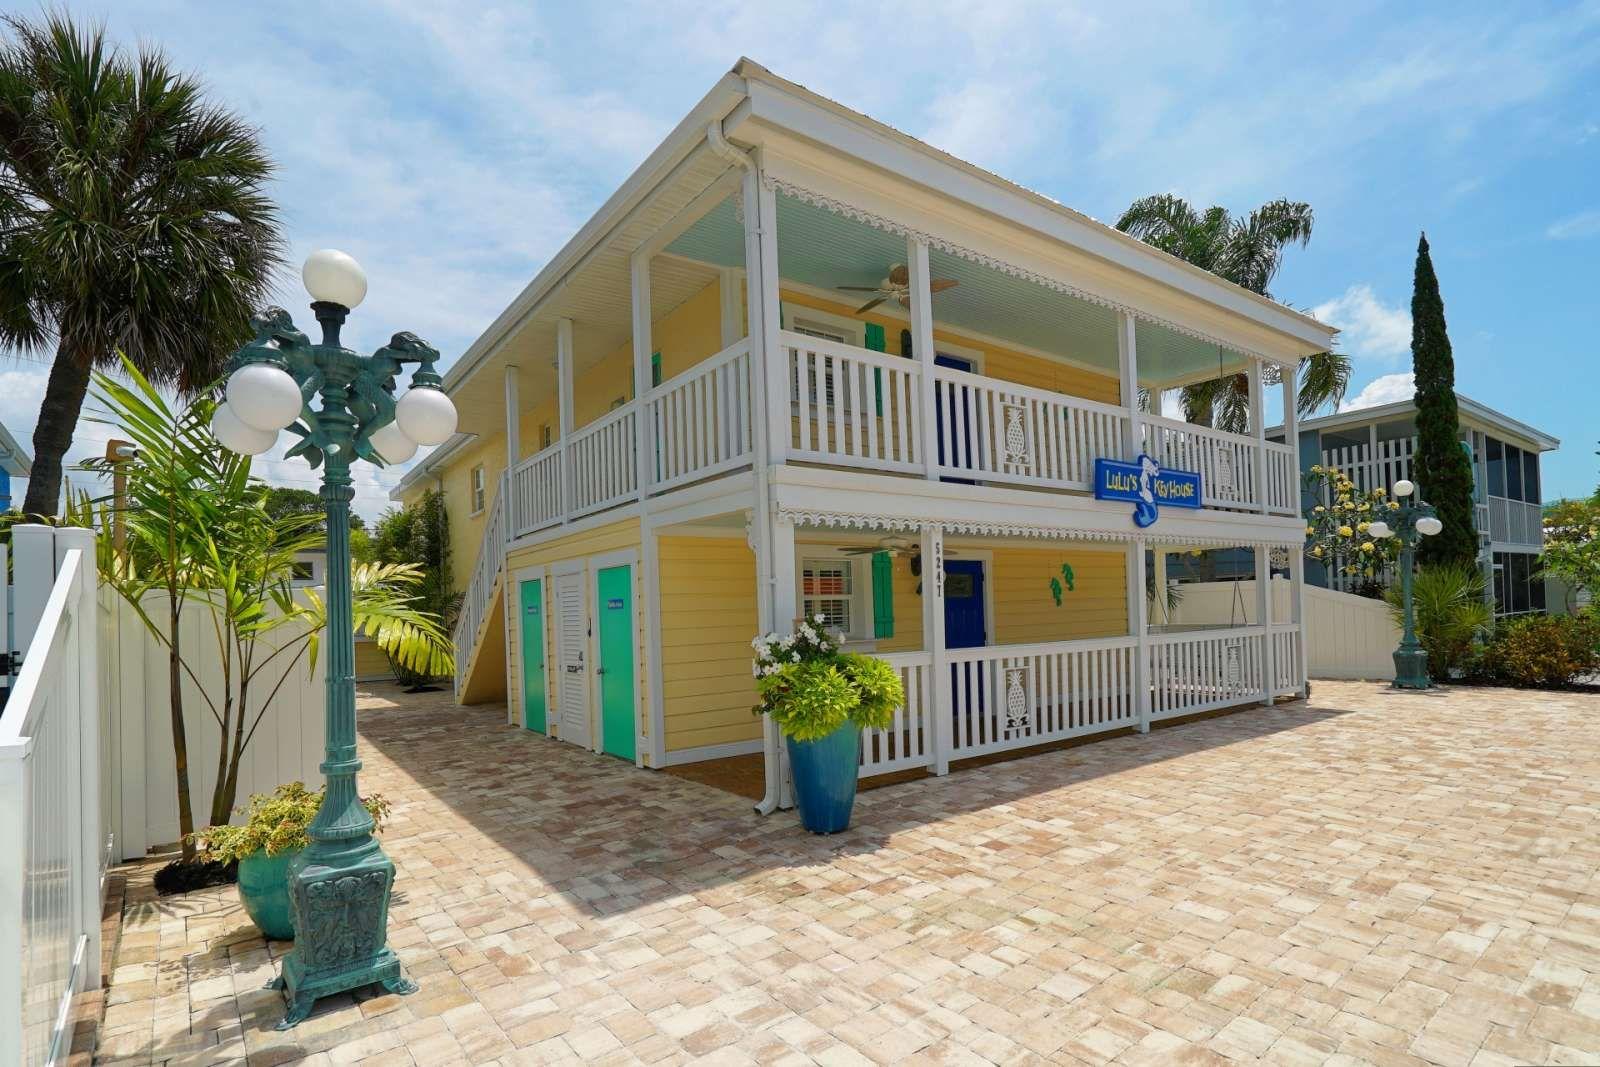 Siesta Key Vacation Rental Lulu S Key House In Siesta Key Village Pool Walk To B Florida Keys Vacation Rentals Vacation Home Rentals Florida Keys Beaches